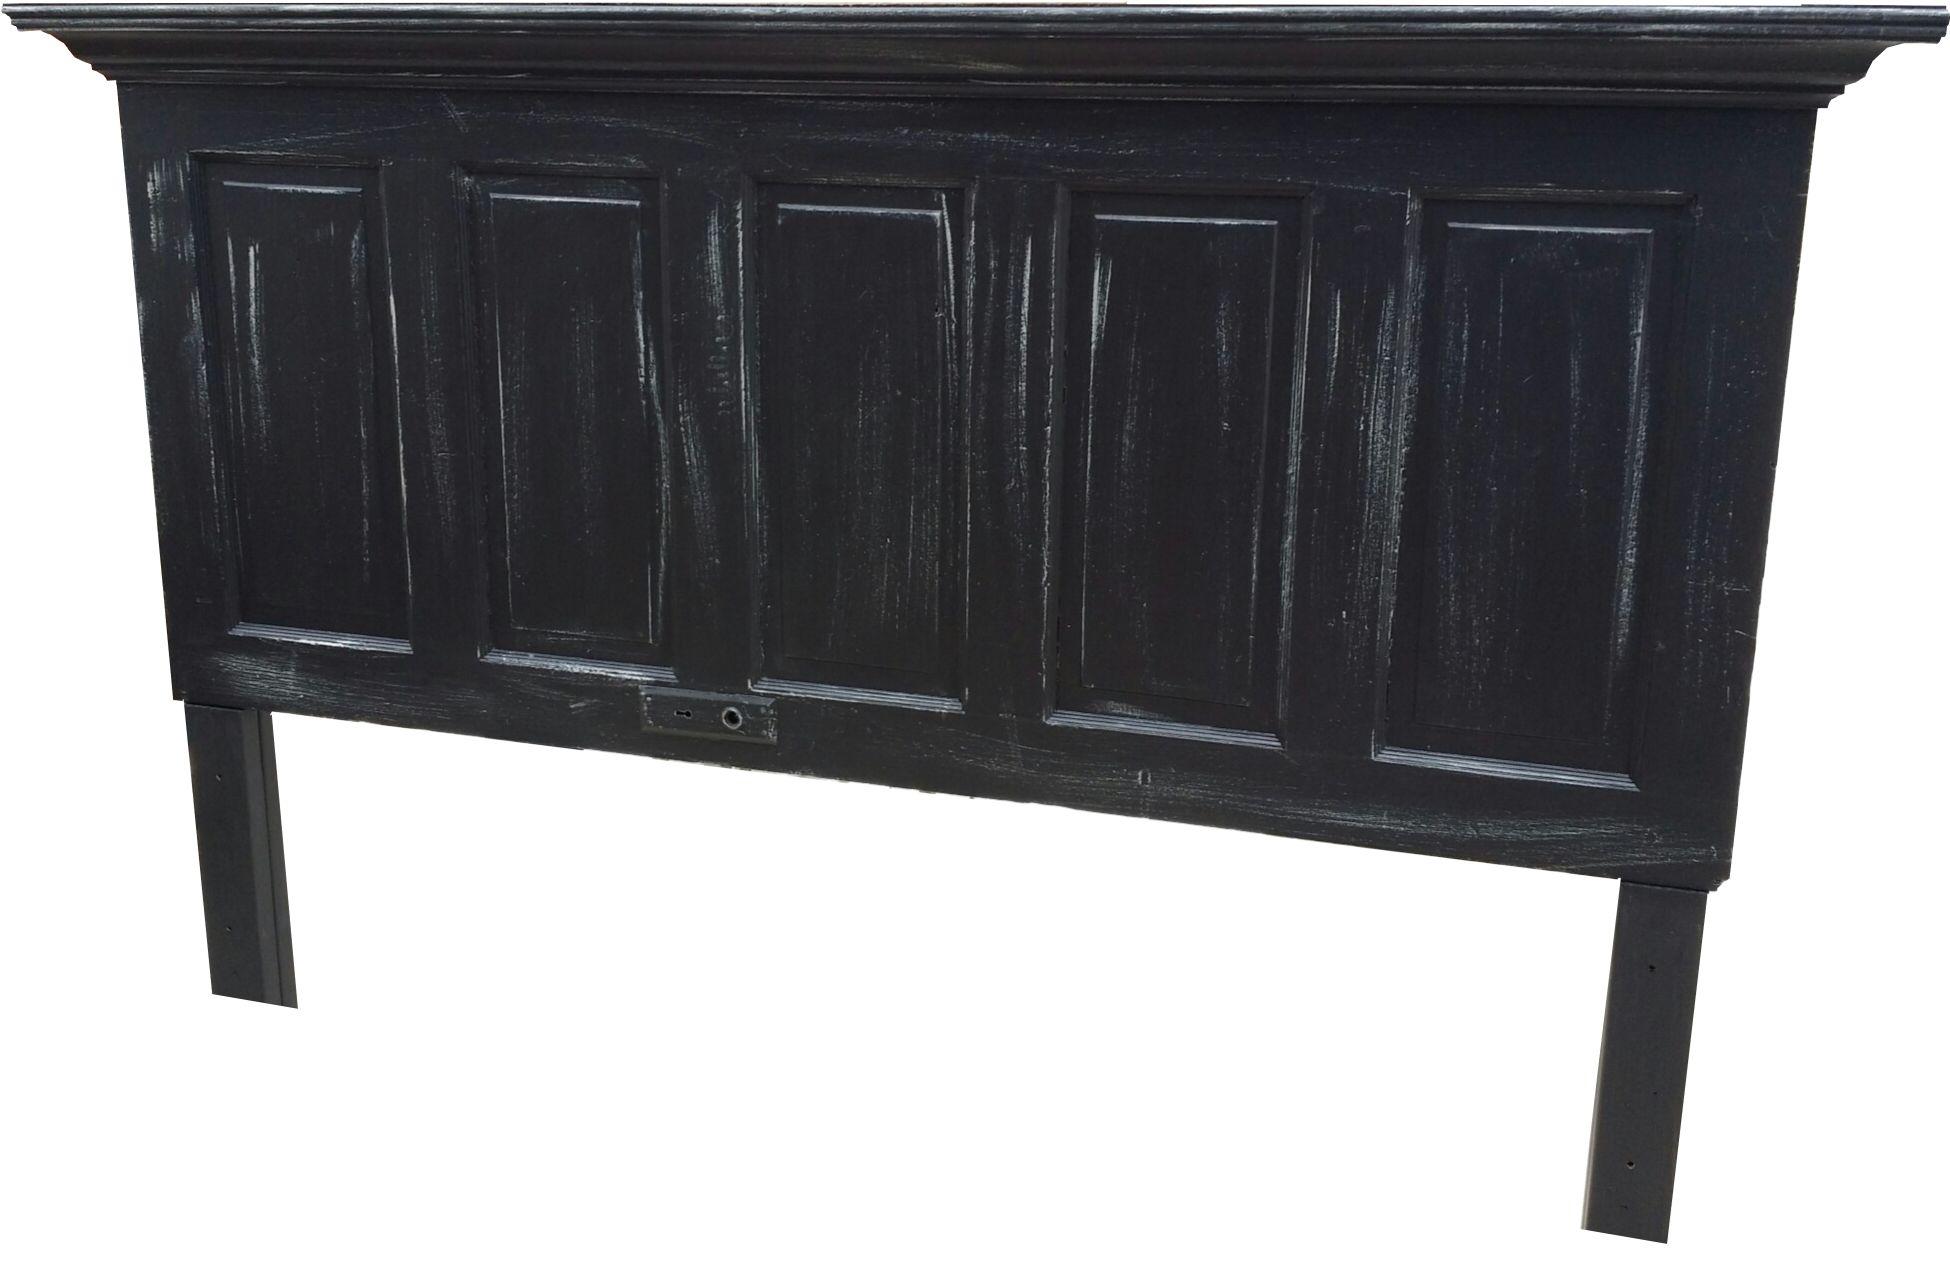 Vintage Headboards 5 Panel Onyx Black With Faux Distressing King Size Headboard Legs